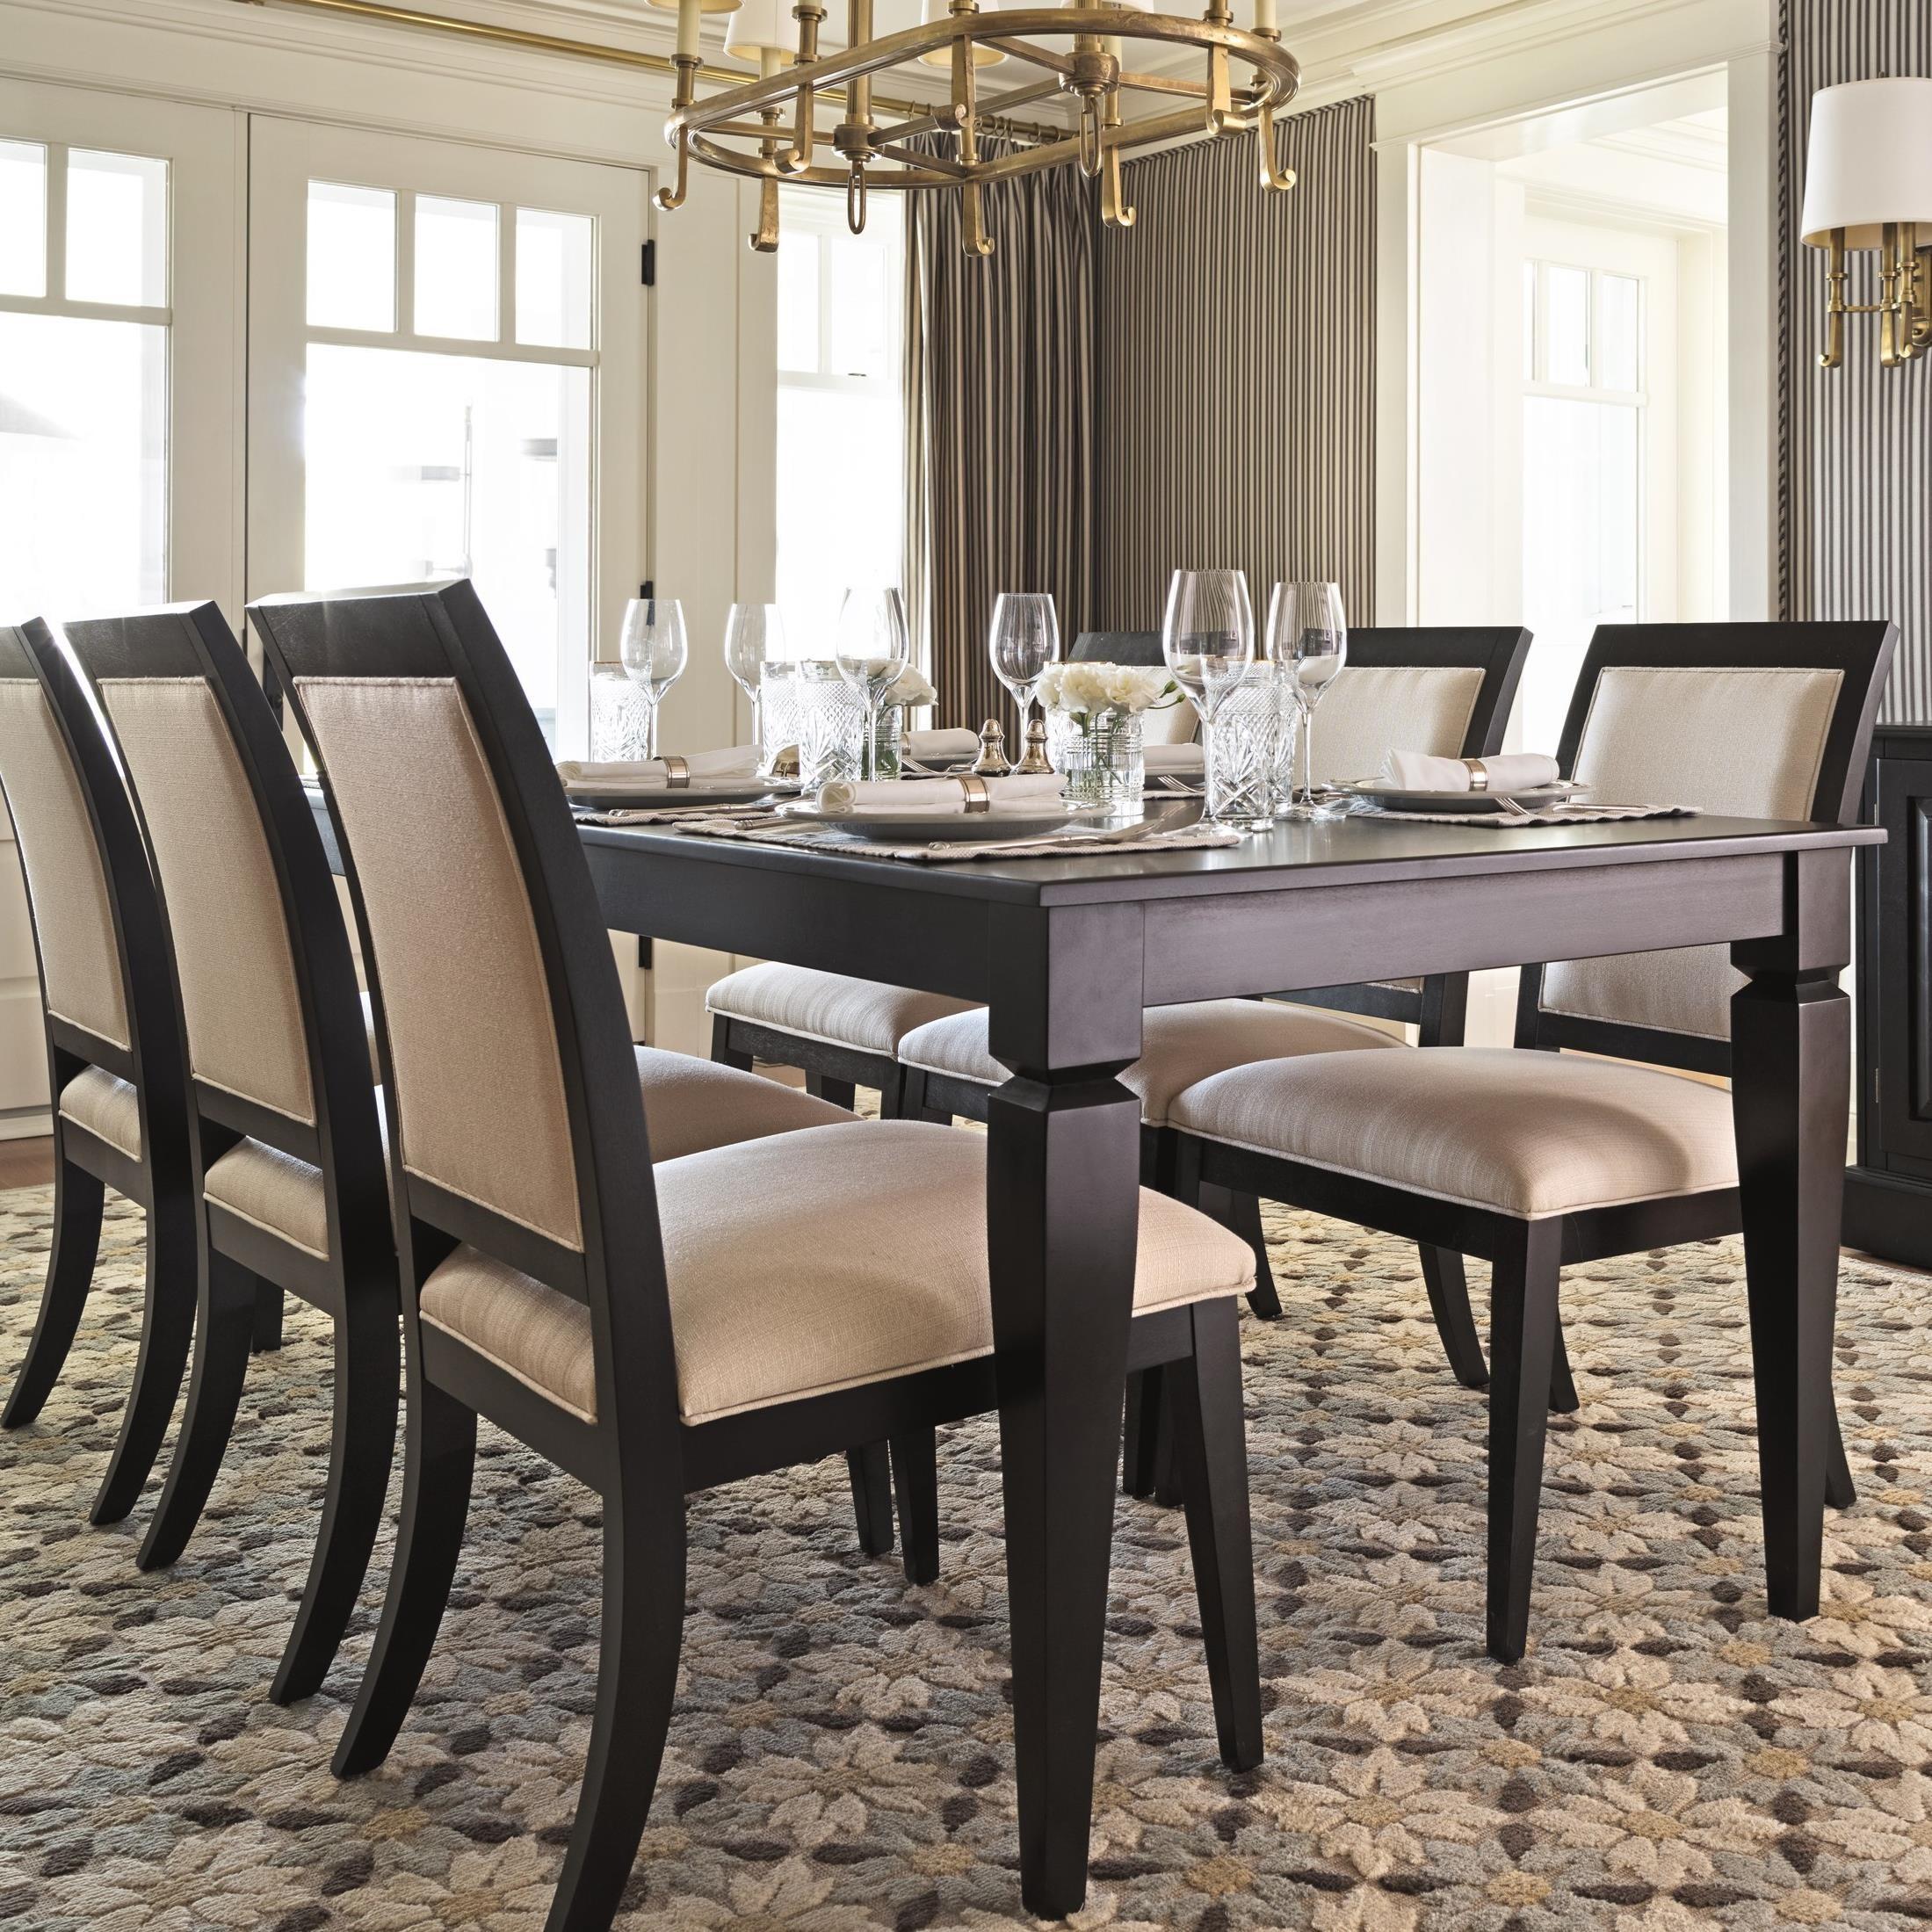 canadel custom dining customizable rectangular dining table set rh belfortfurniture com Restaurant Dining Room Luxury Dining Room